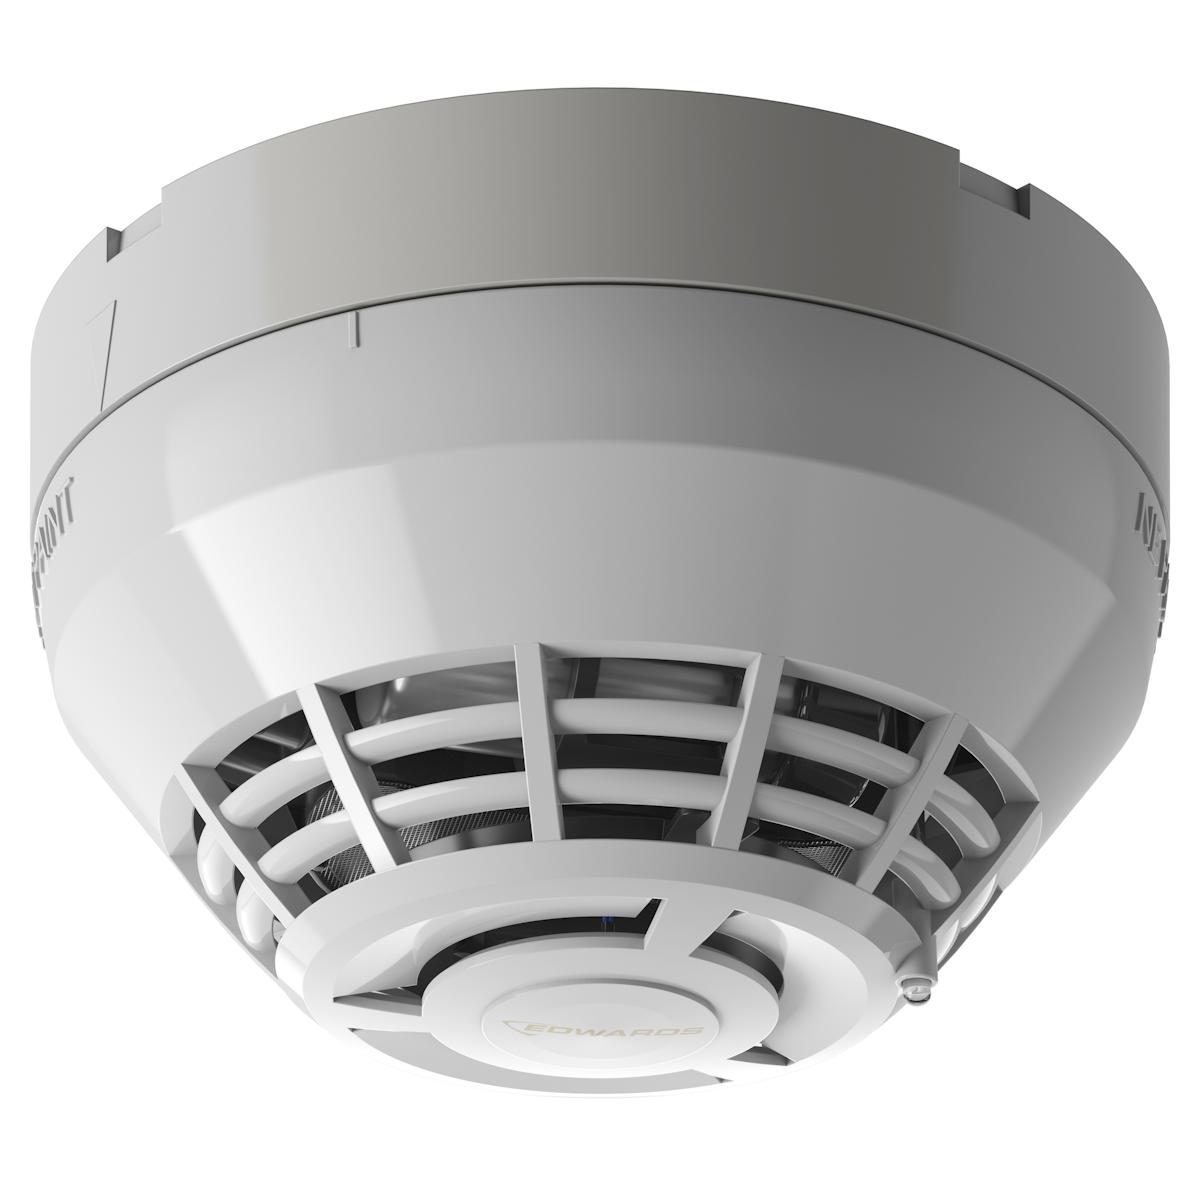 Edwards Multi Criteria Smoke Detector To Meet 2020 Ul Standard